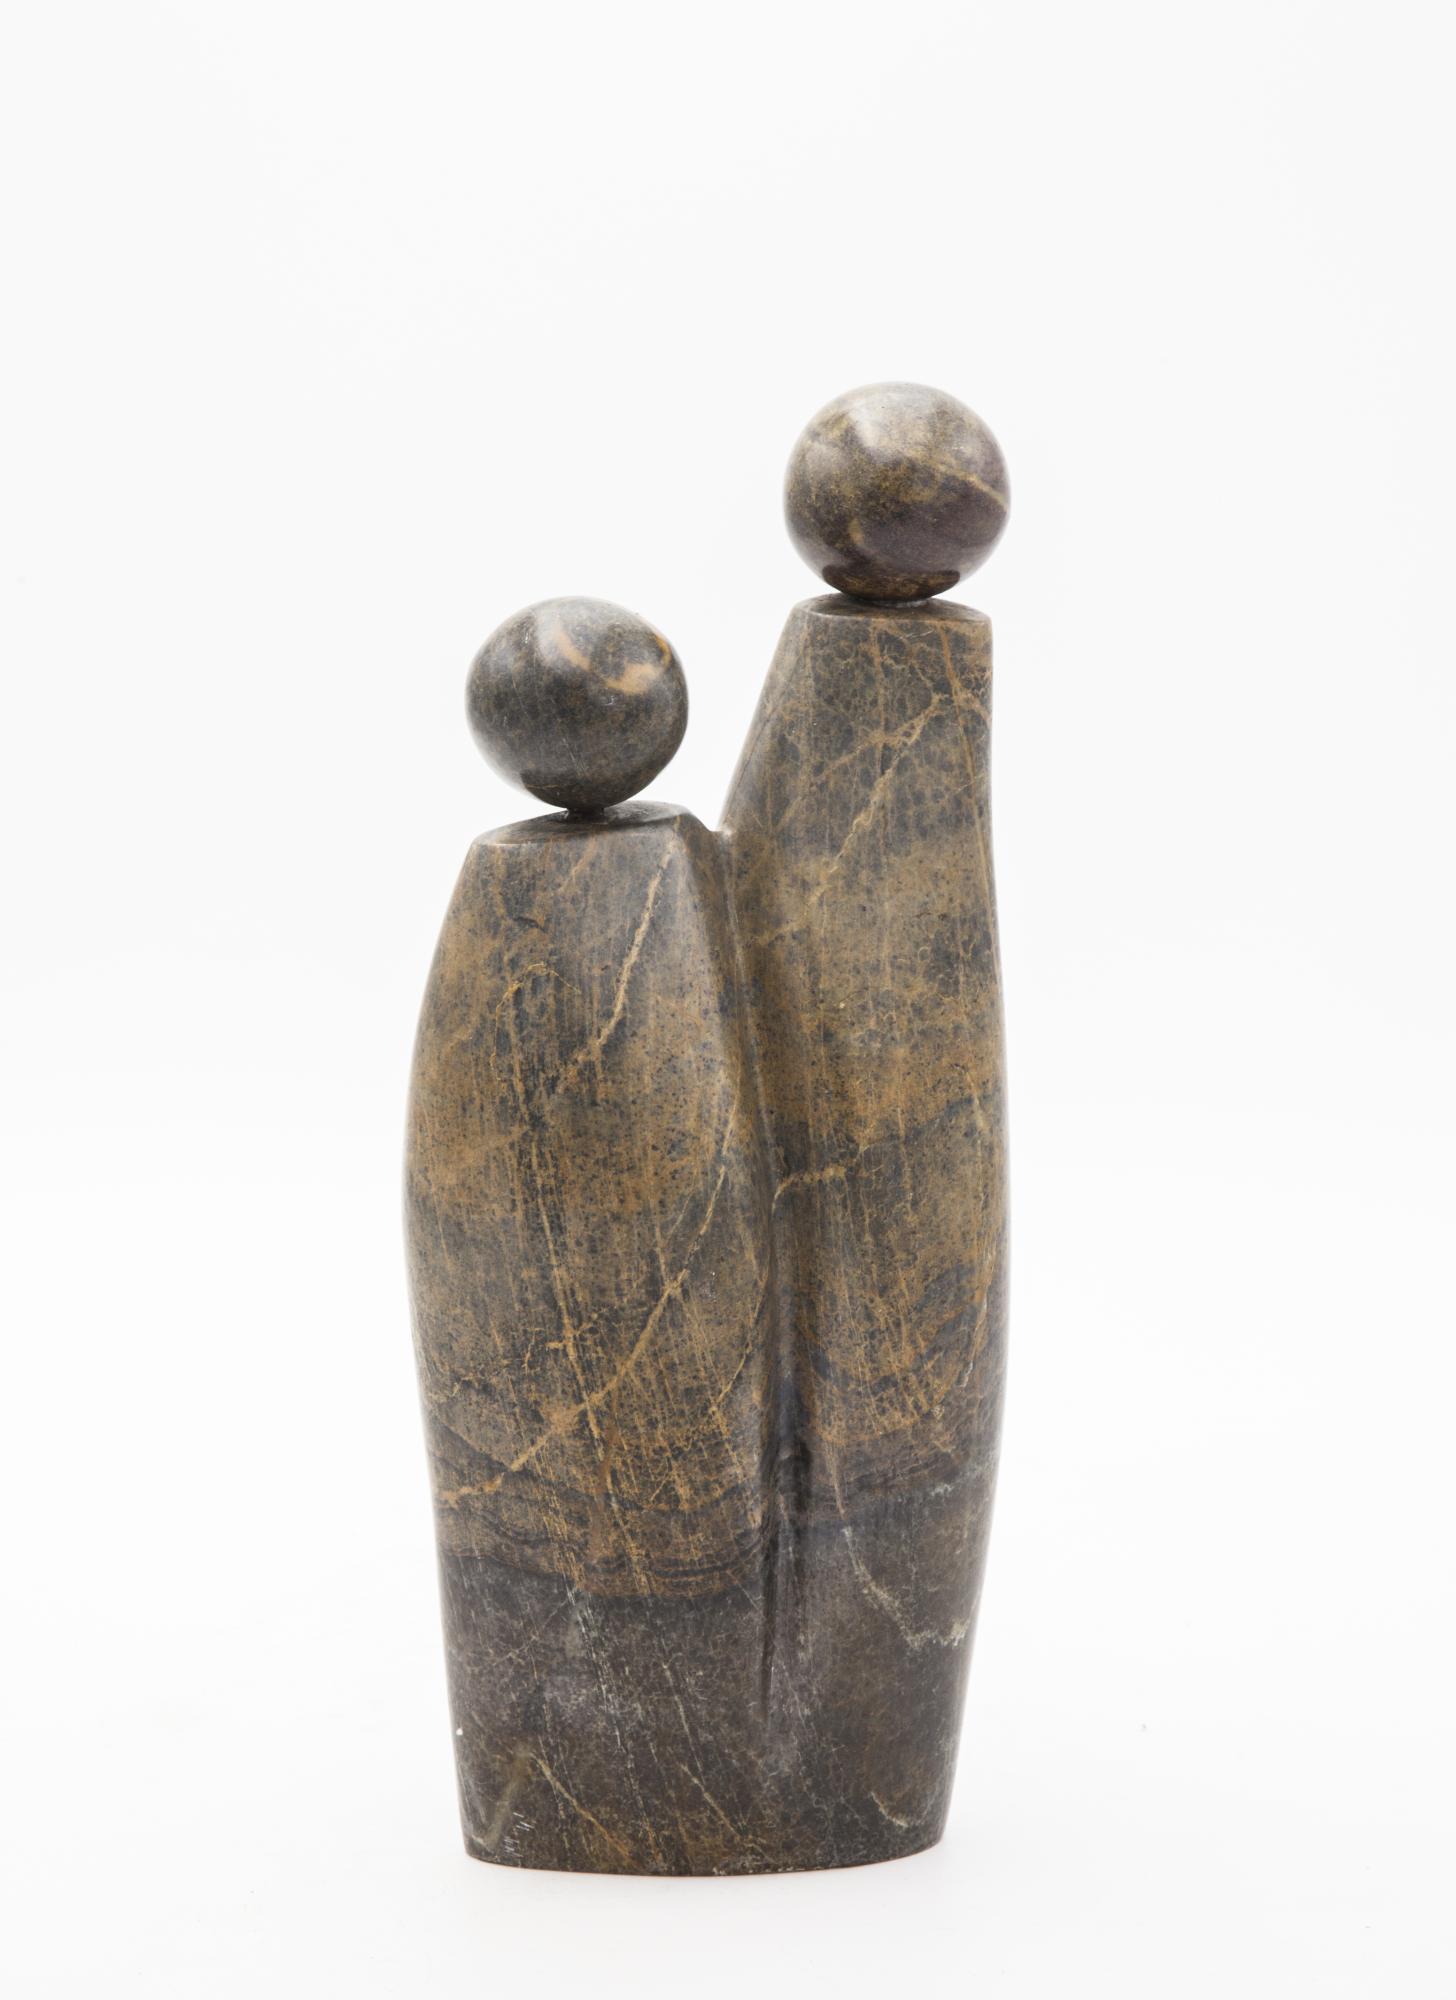 Lot 33 - Sculpture: Fungai Dodzo, Generations, Serpentine stone, 29cm high by 13cm wide by 8cm deep